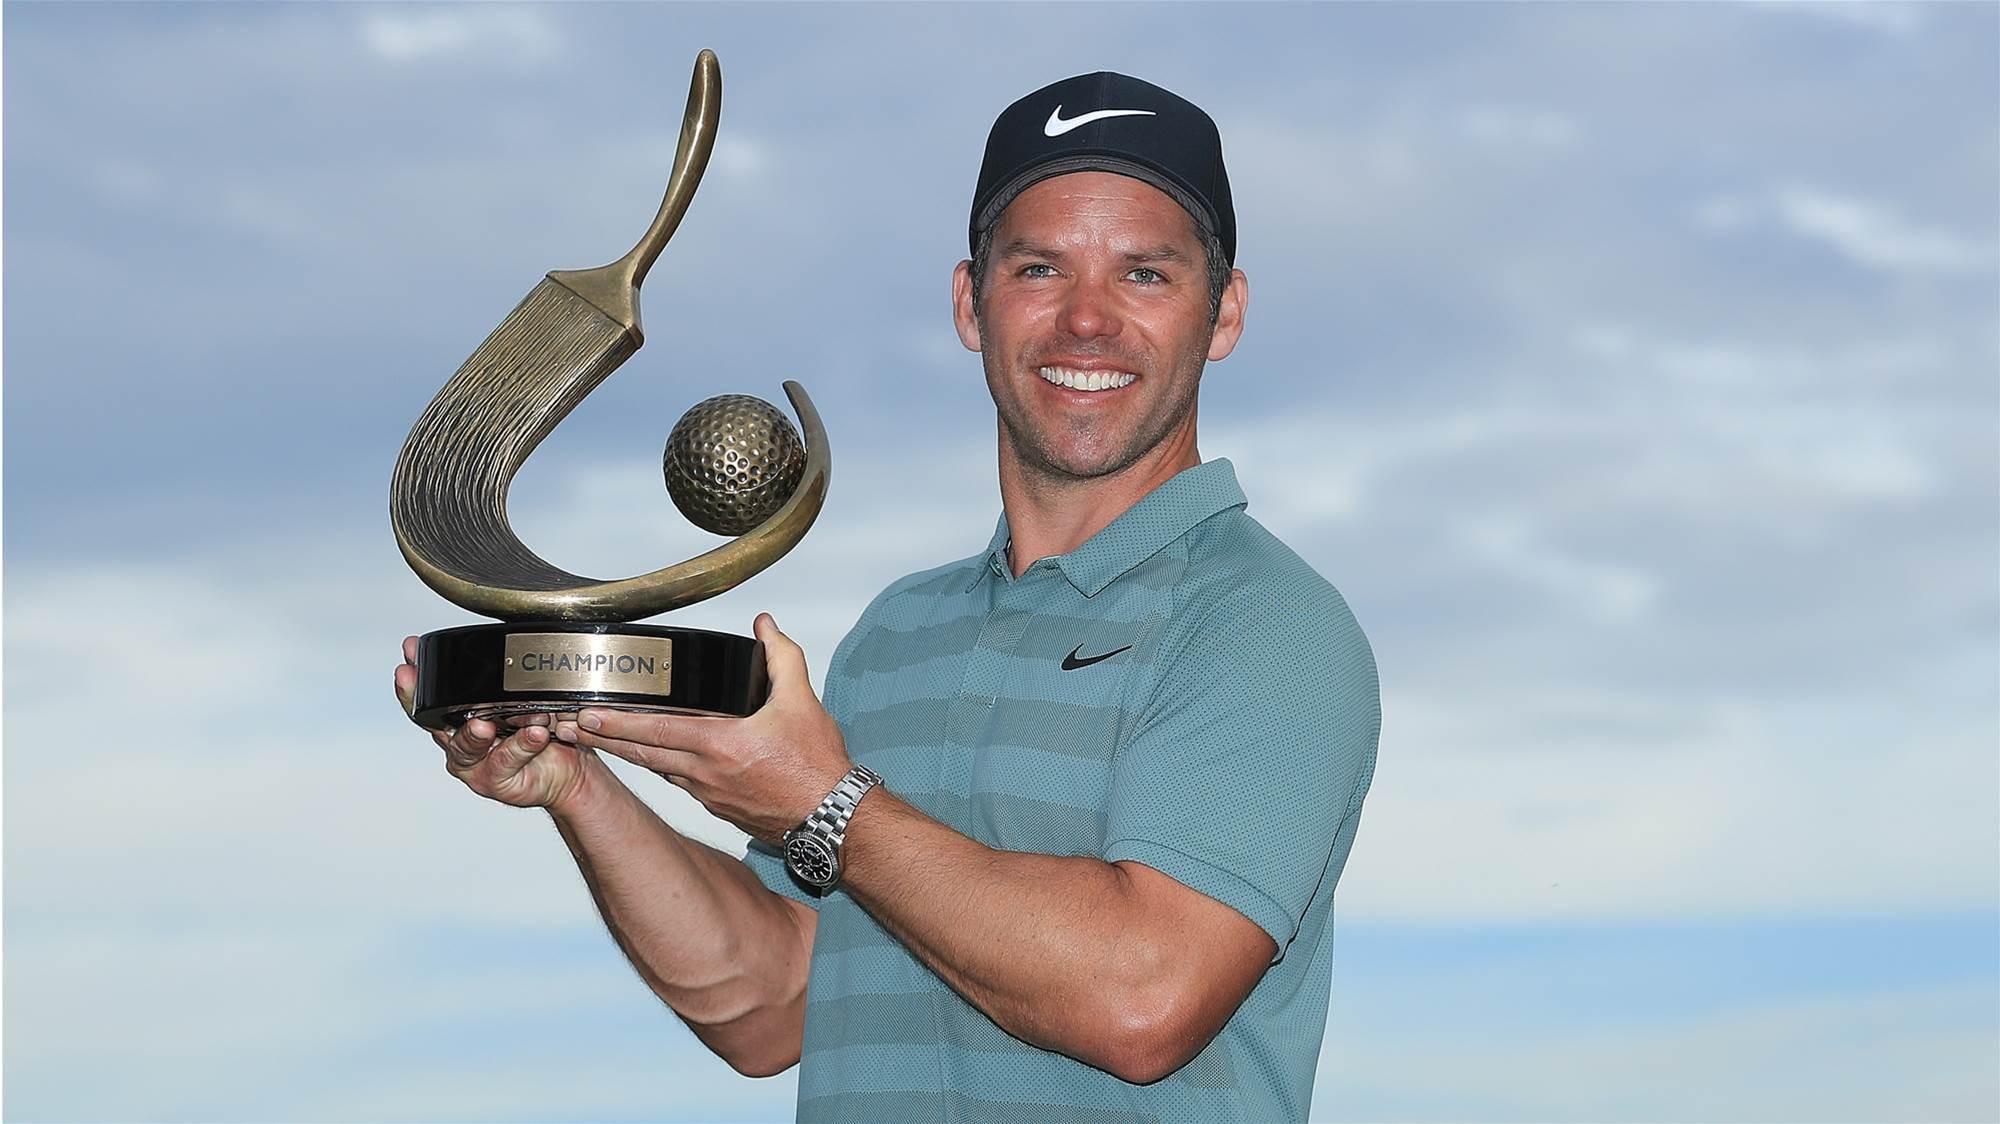 Casey upstages Tiger Woods to win Valspar